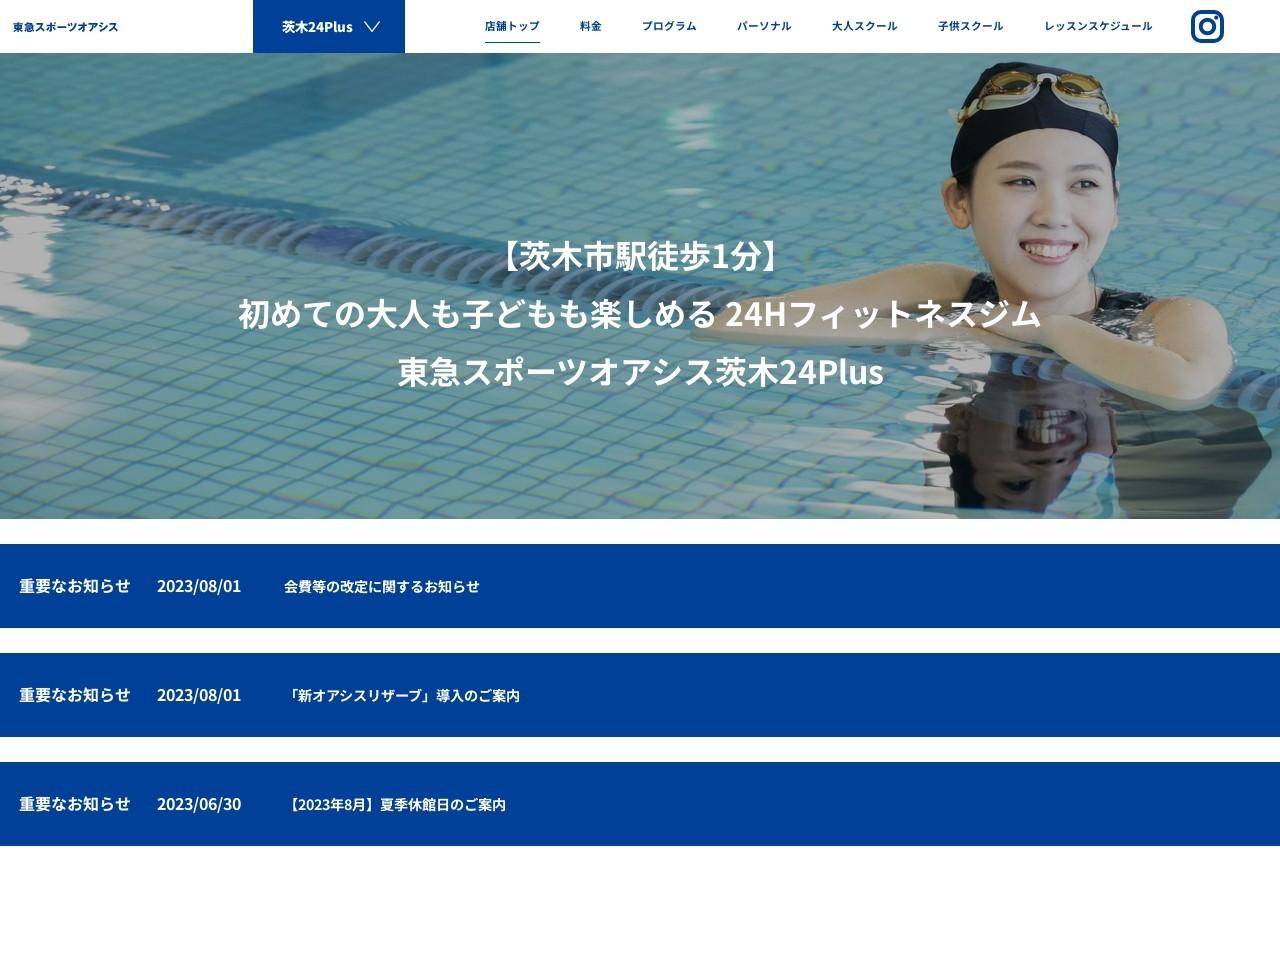 Oasis茨木24Plusのイメージ写真